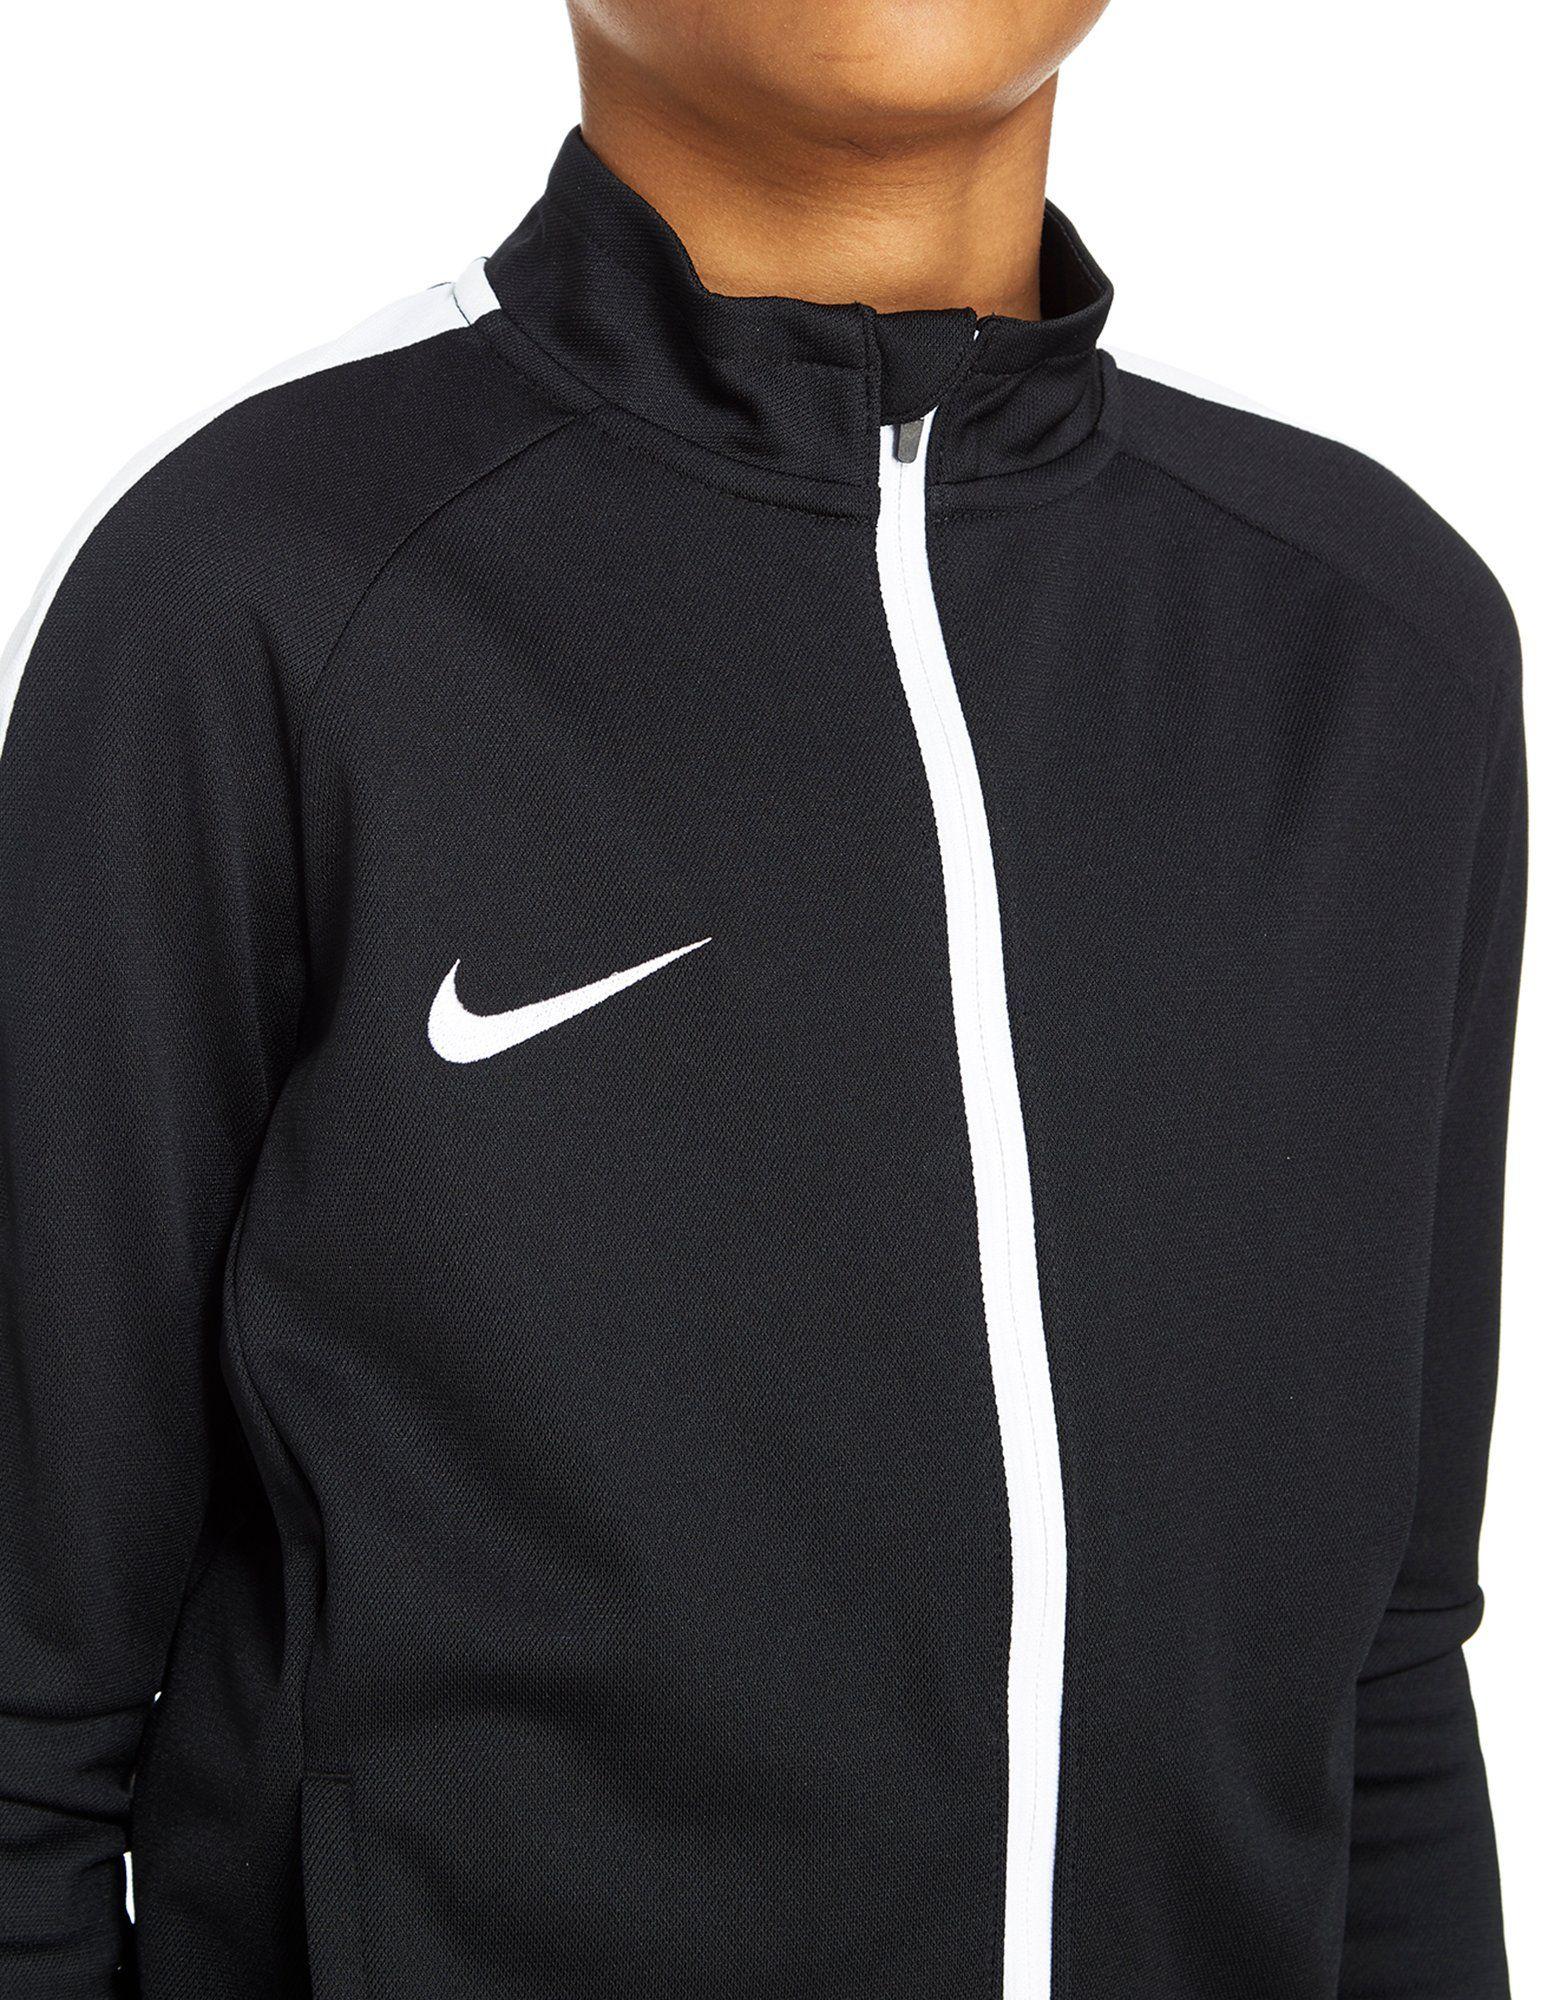 Nike conjunto de chándal Academy Pan júnior